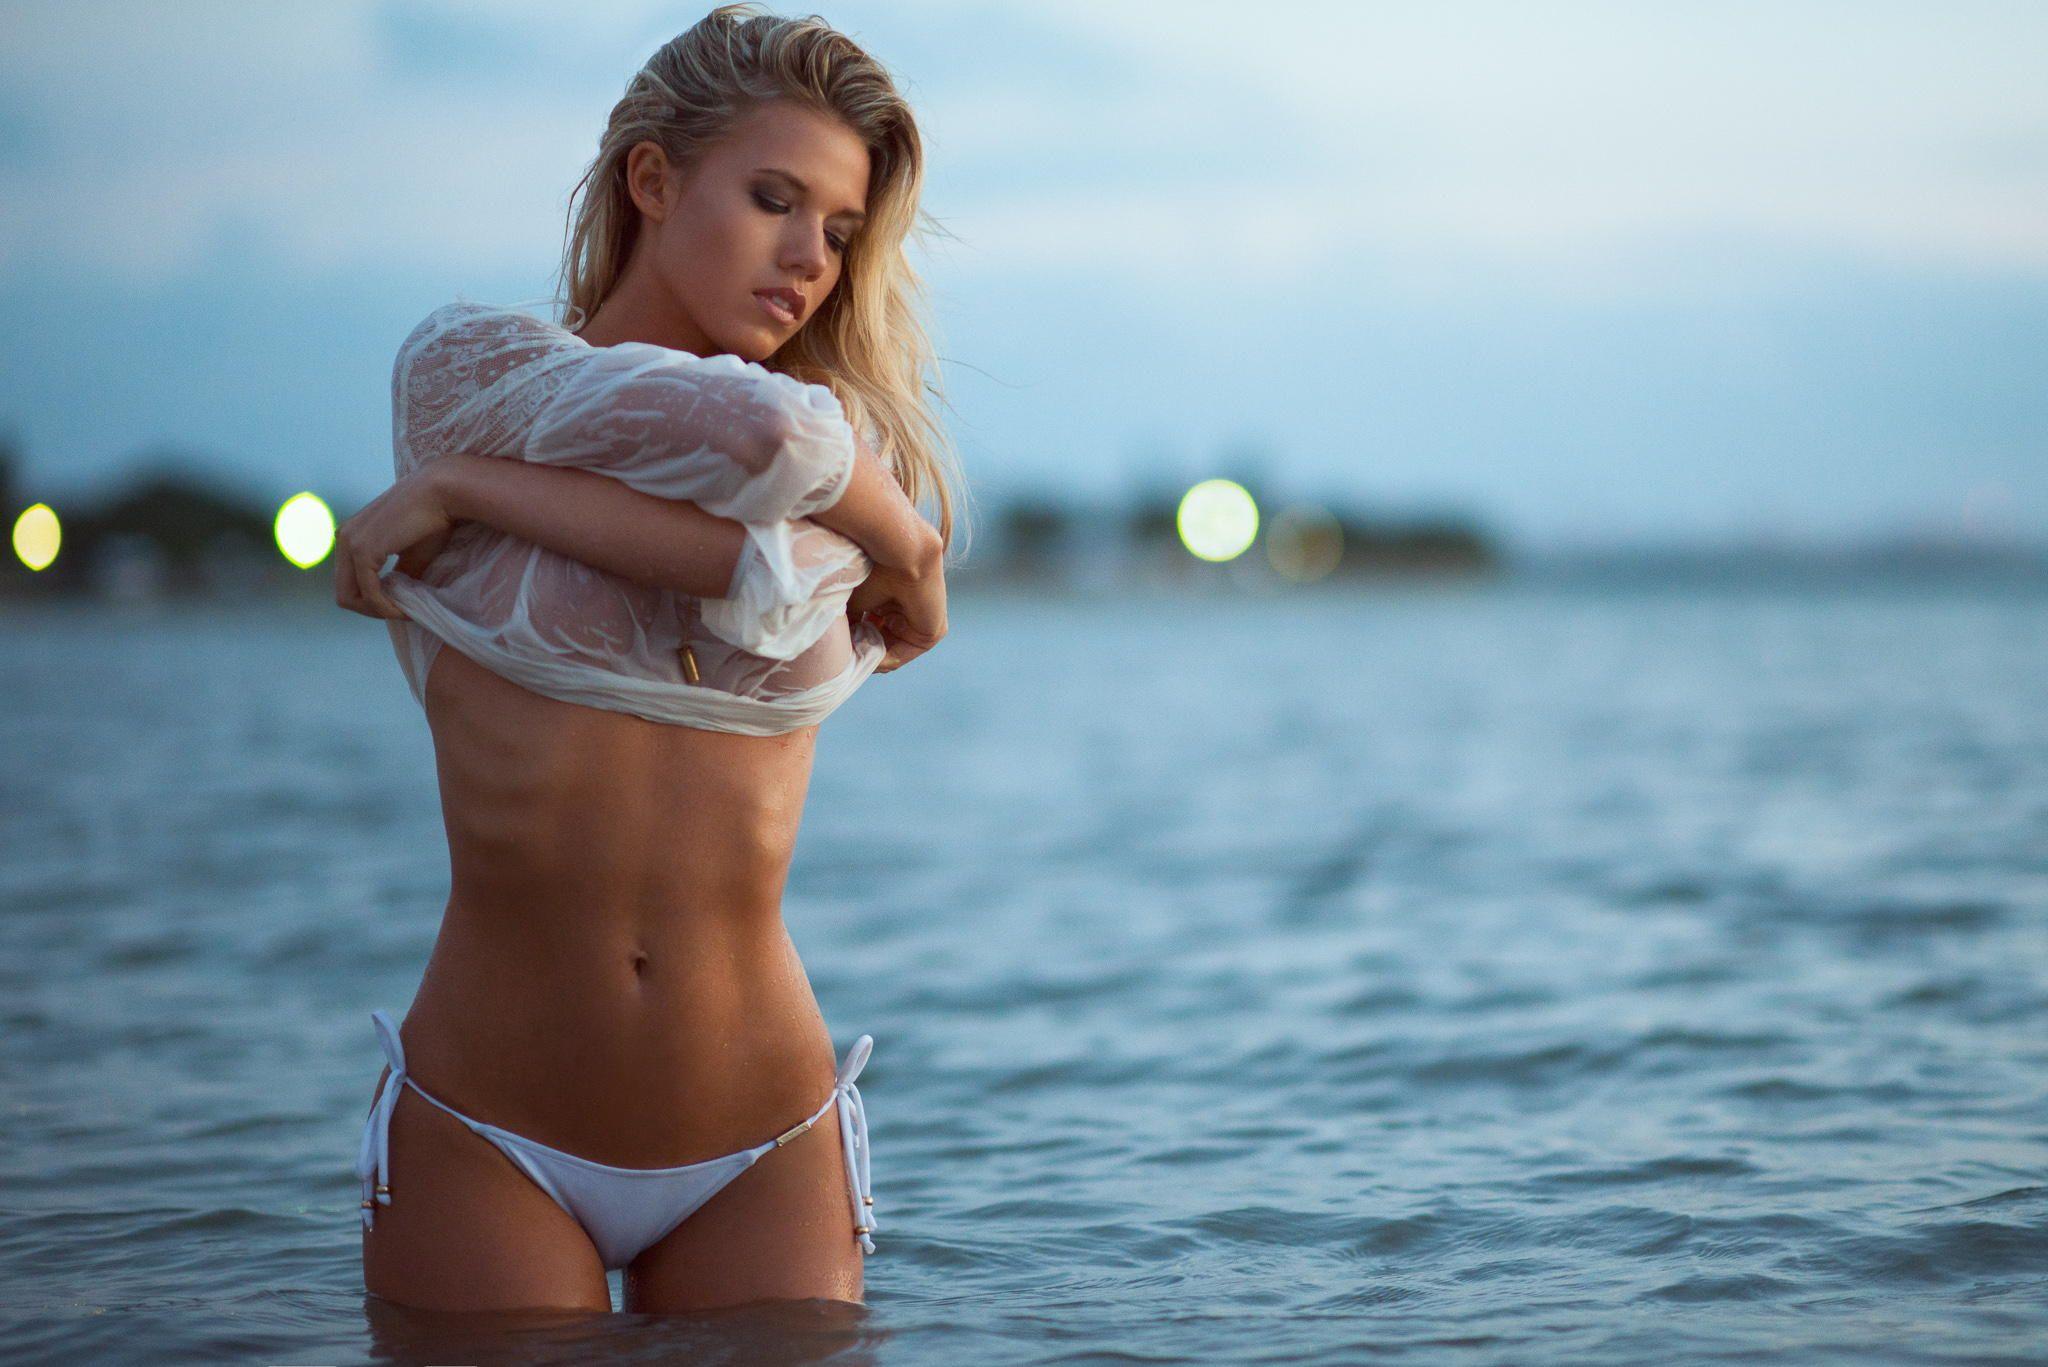 Charlotte mckinney bikini hiding butthole nudes (63 photos)